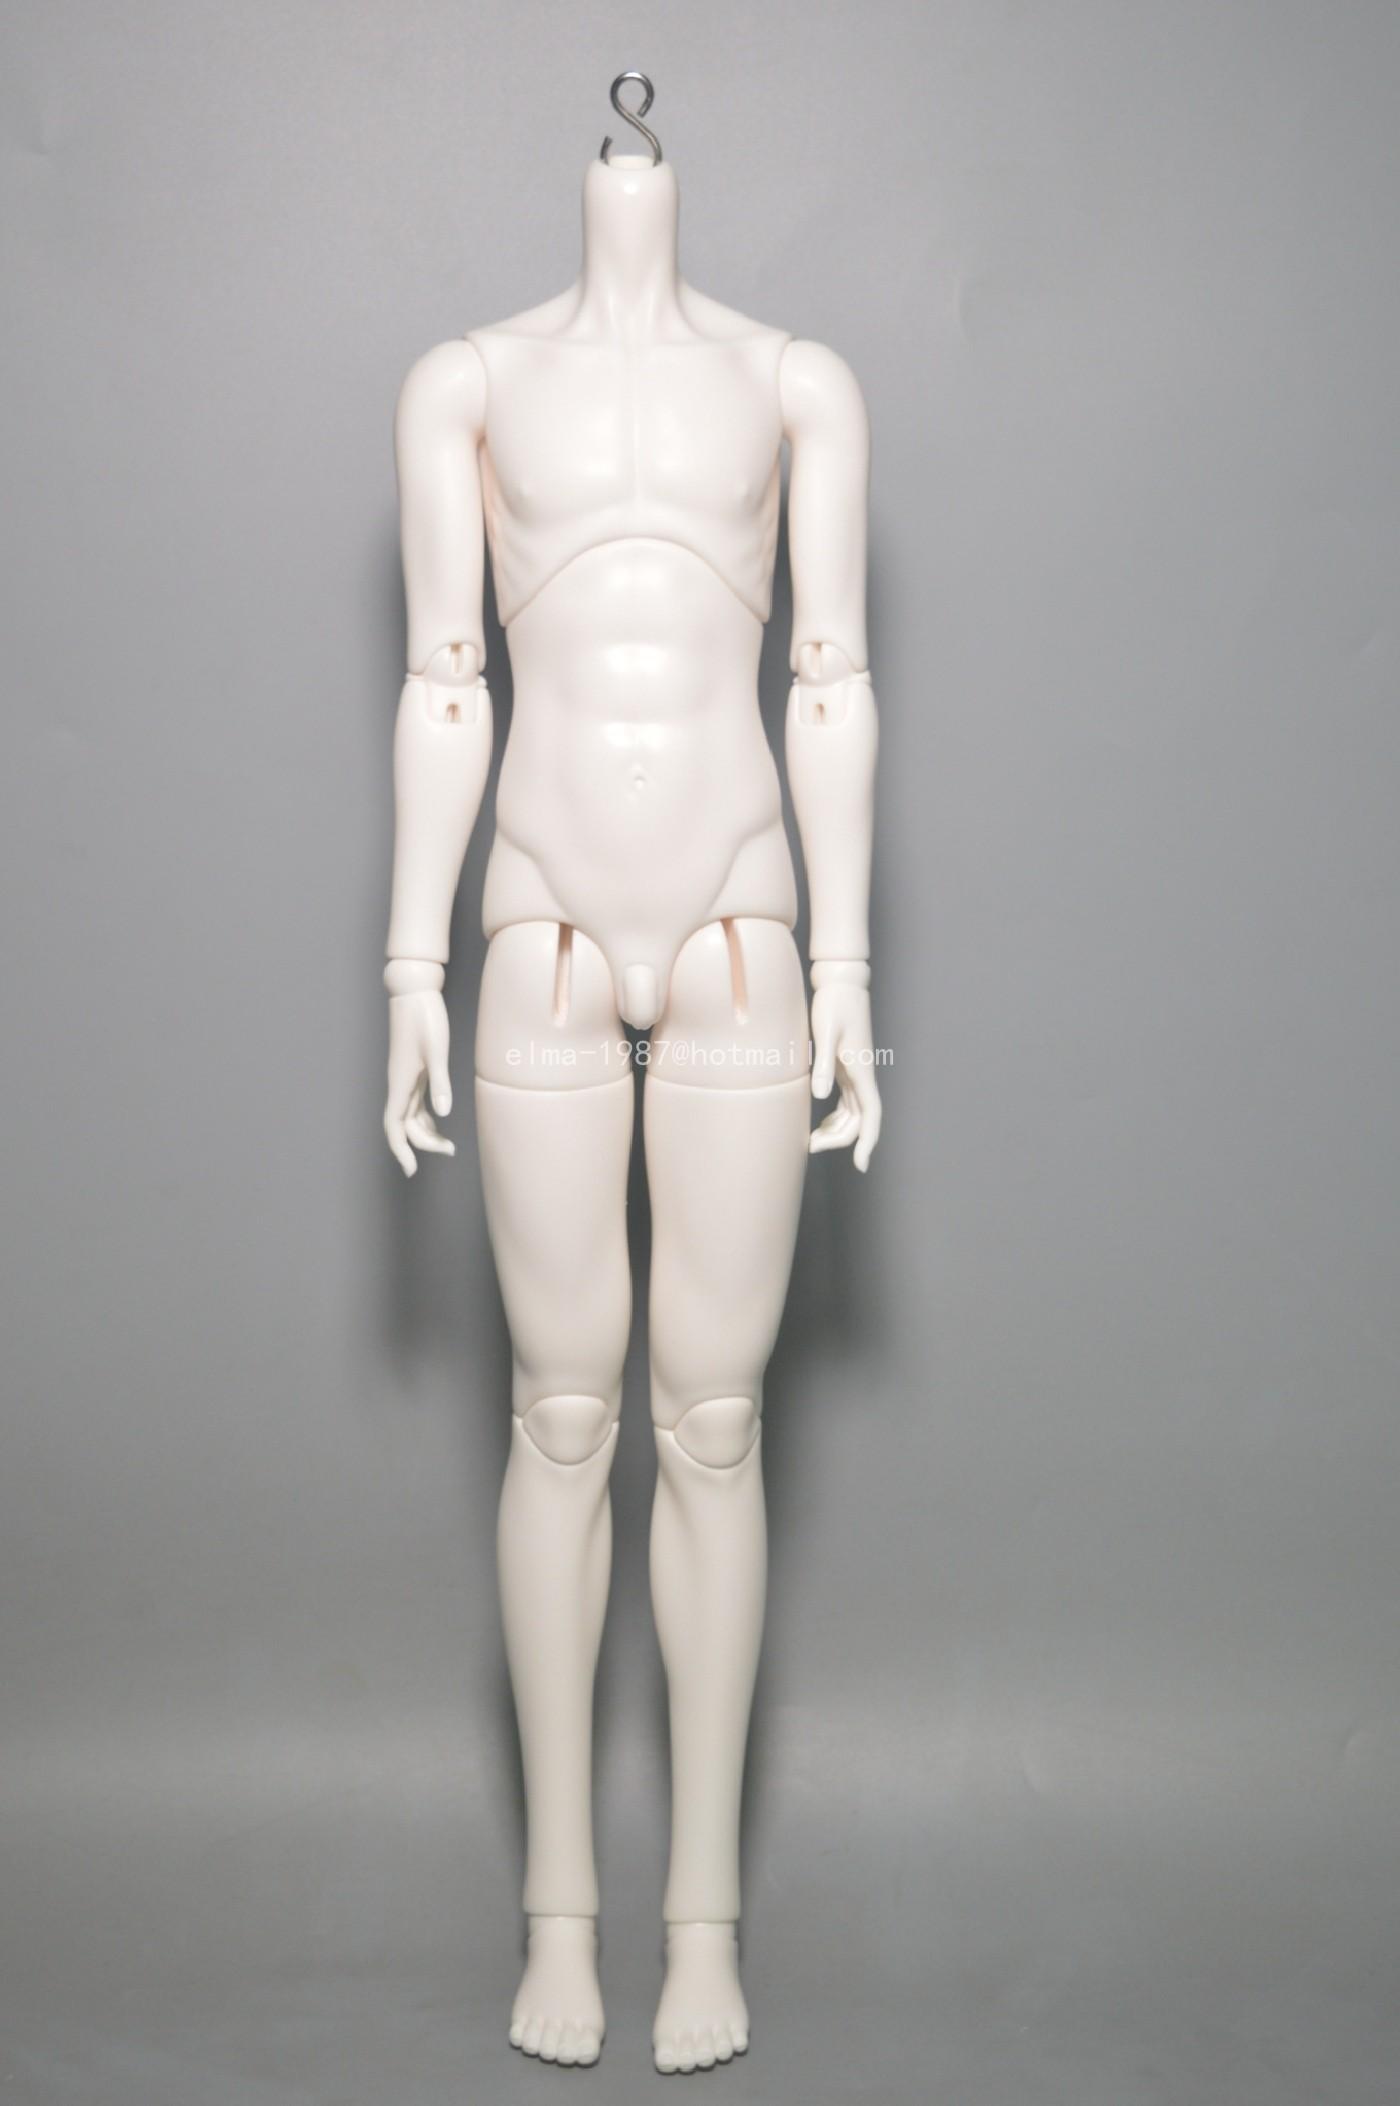 loongsoul-63cm-body_1.jpg